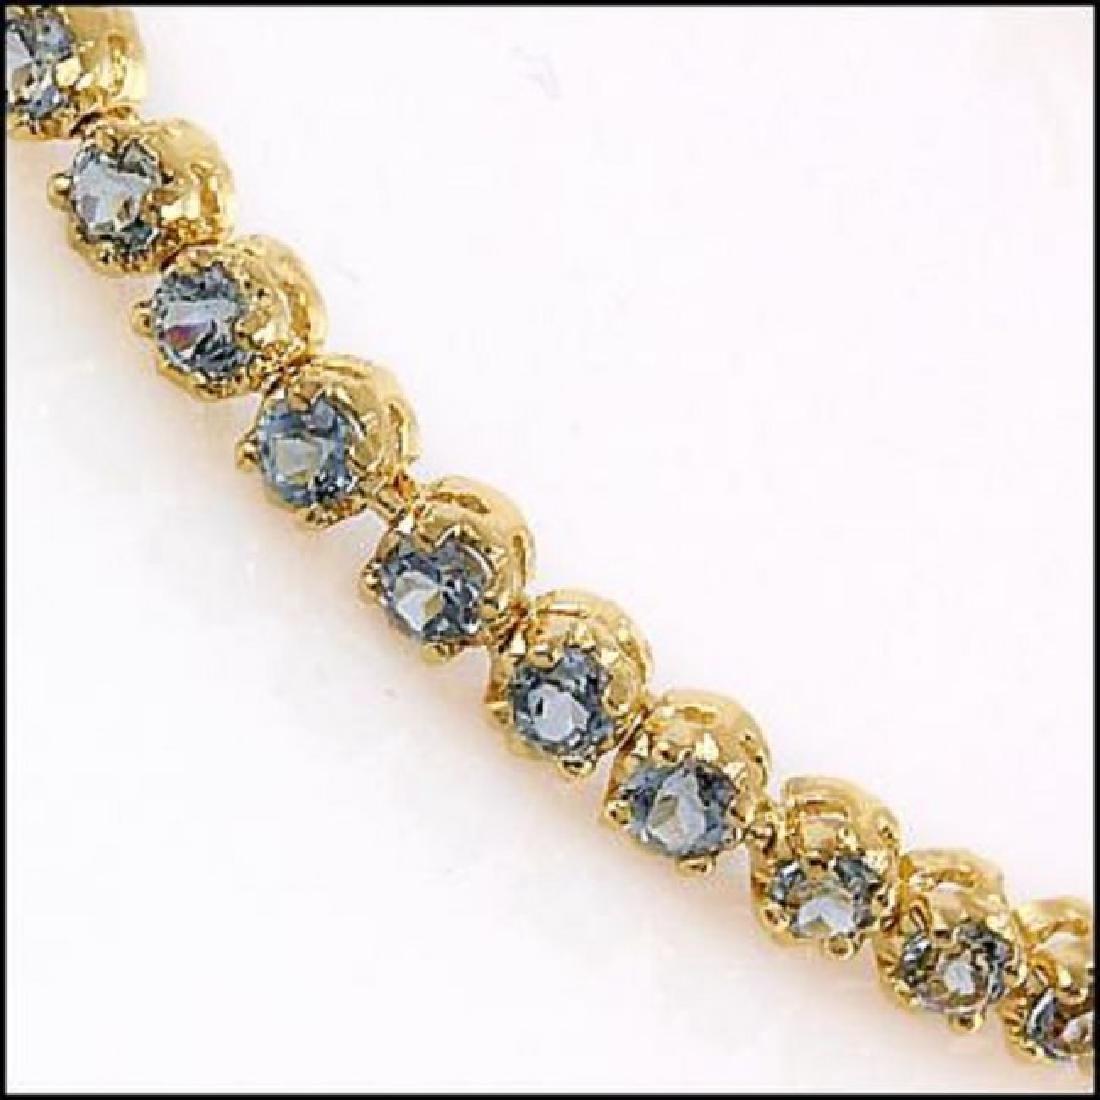 10.22 CT Blue Topaz Tennis Fine Bracelet $1120 - 2